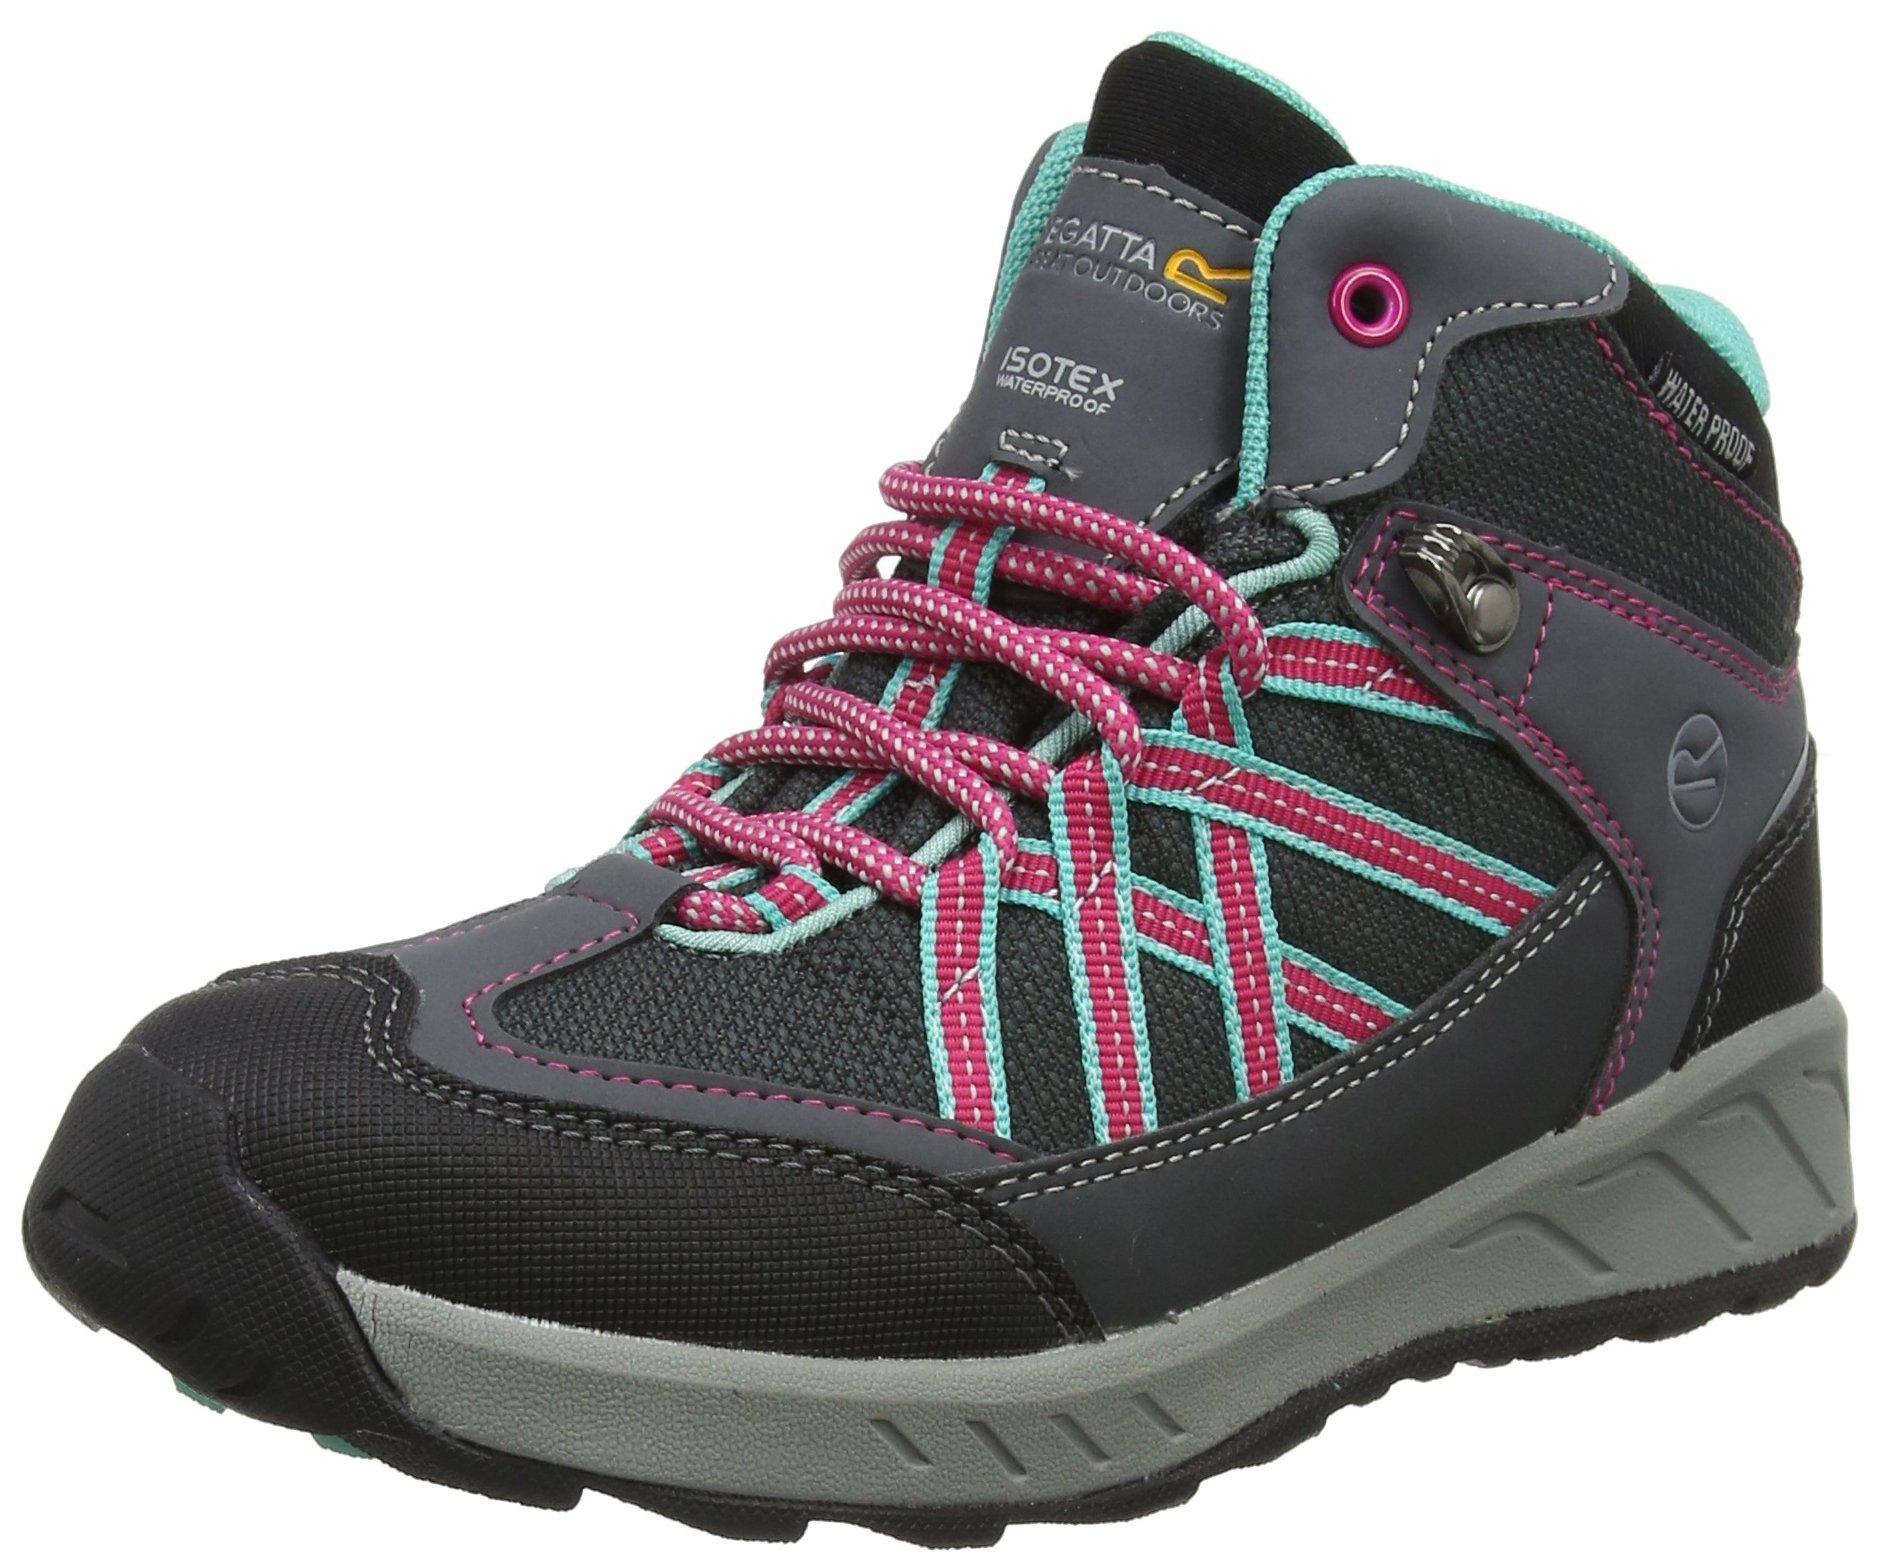 Regatta Samaris Mid Jnr, Girls' High Rise Hiking Boots 1